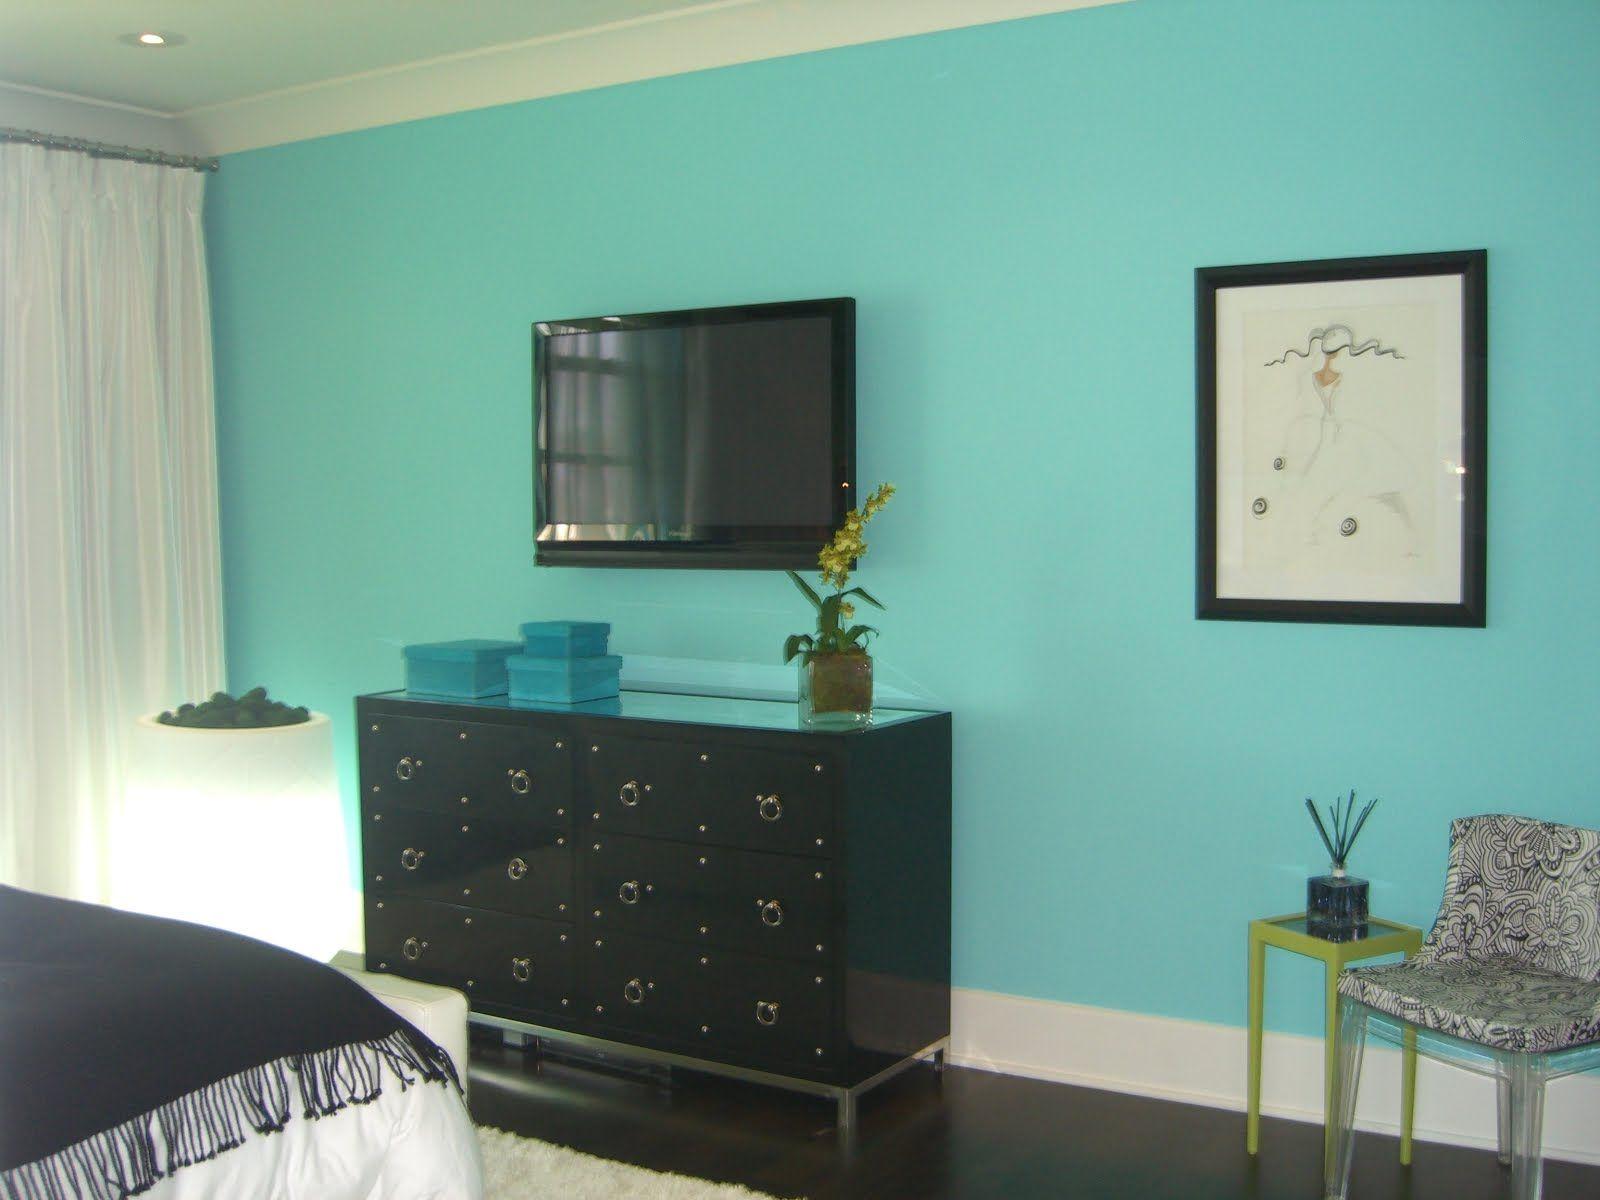 Cimg2574 Jpg 1600 1200 Living Room Turquoise Living Room Wall Color Room Wall Colors